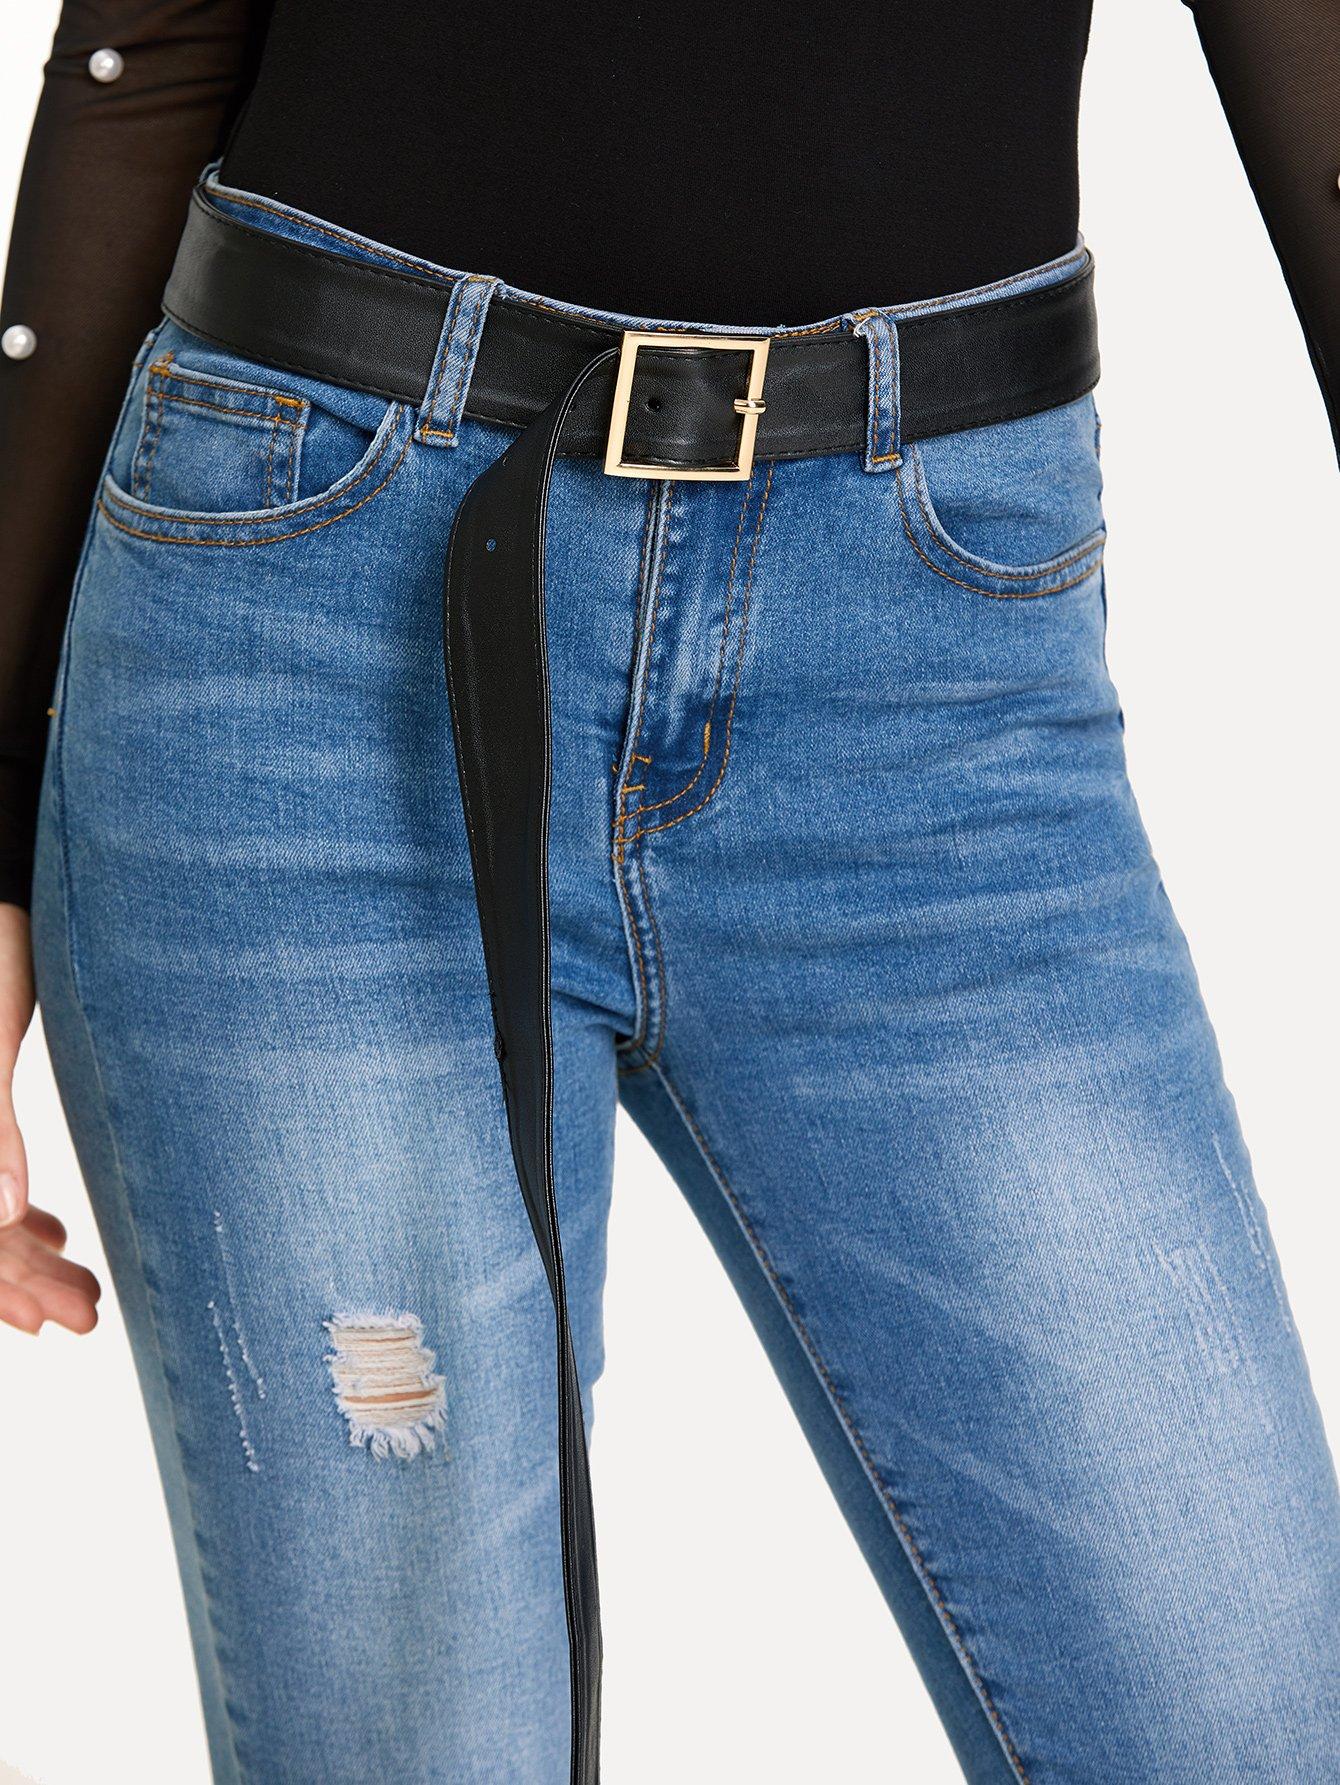 Square Buckle Belt women fashion square buckle basic dress leatherette wide belt